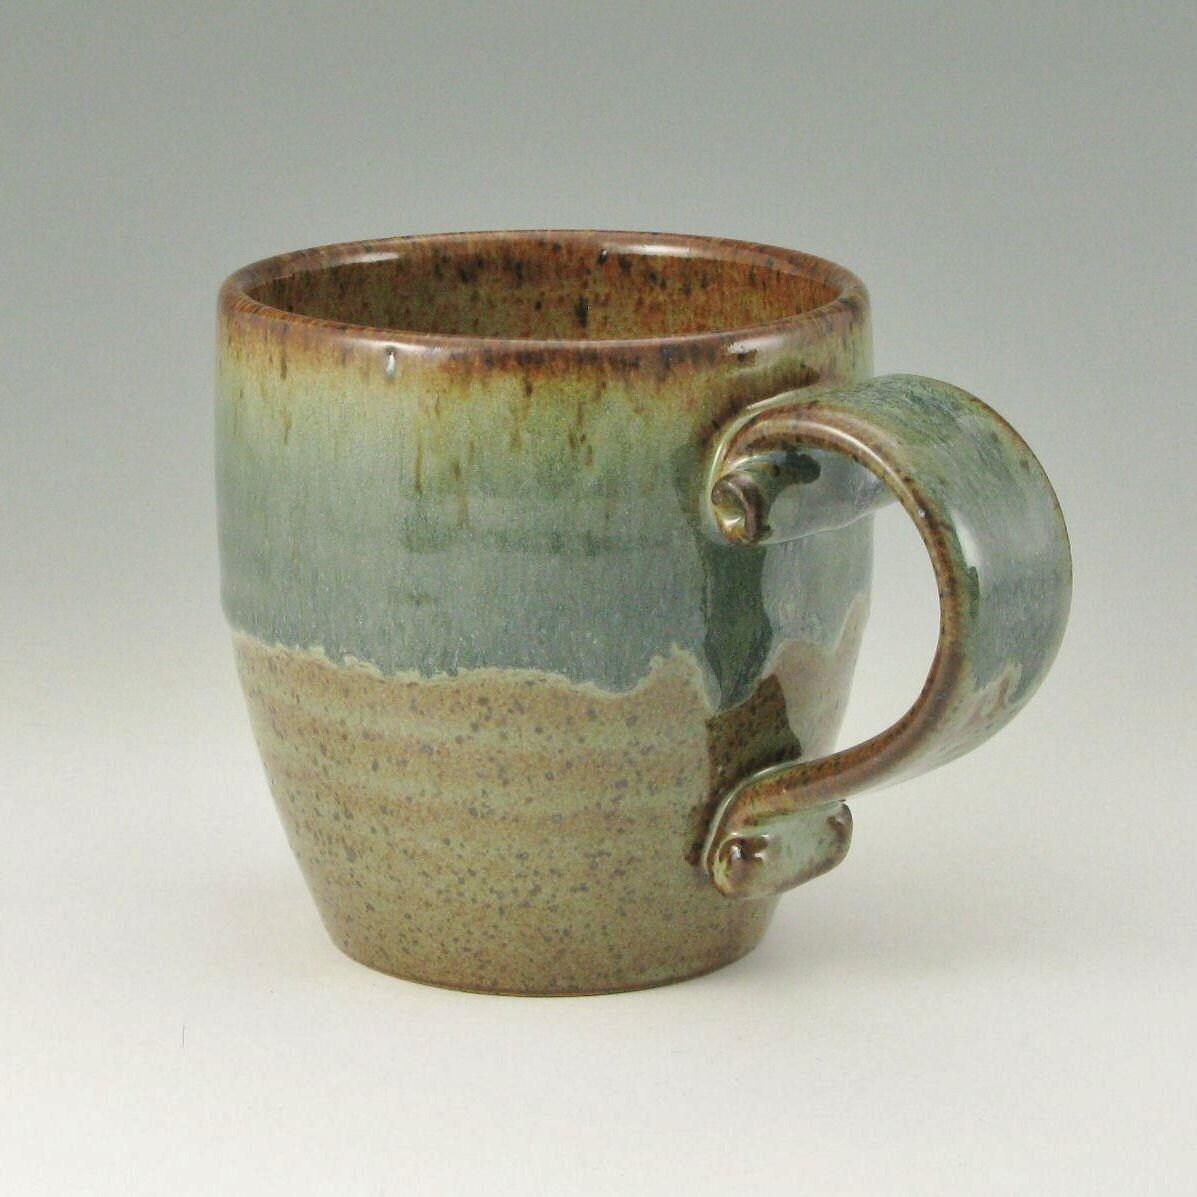 SALE - Holiday Finale Coffee Mug, Beer Mug, Tea Cup, One Bistro16 Mug, Green Iced Honey Brown and Sage Green, Ready To Ship